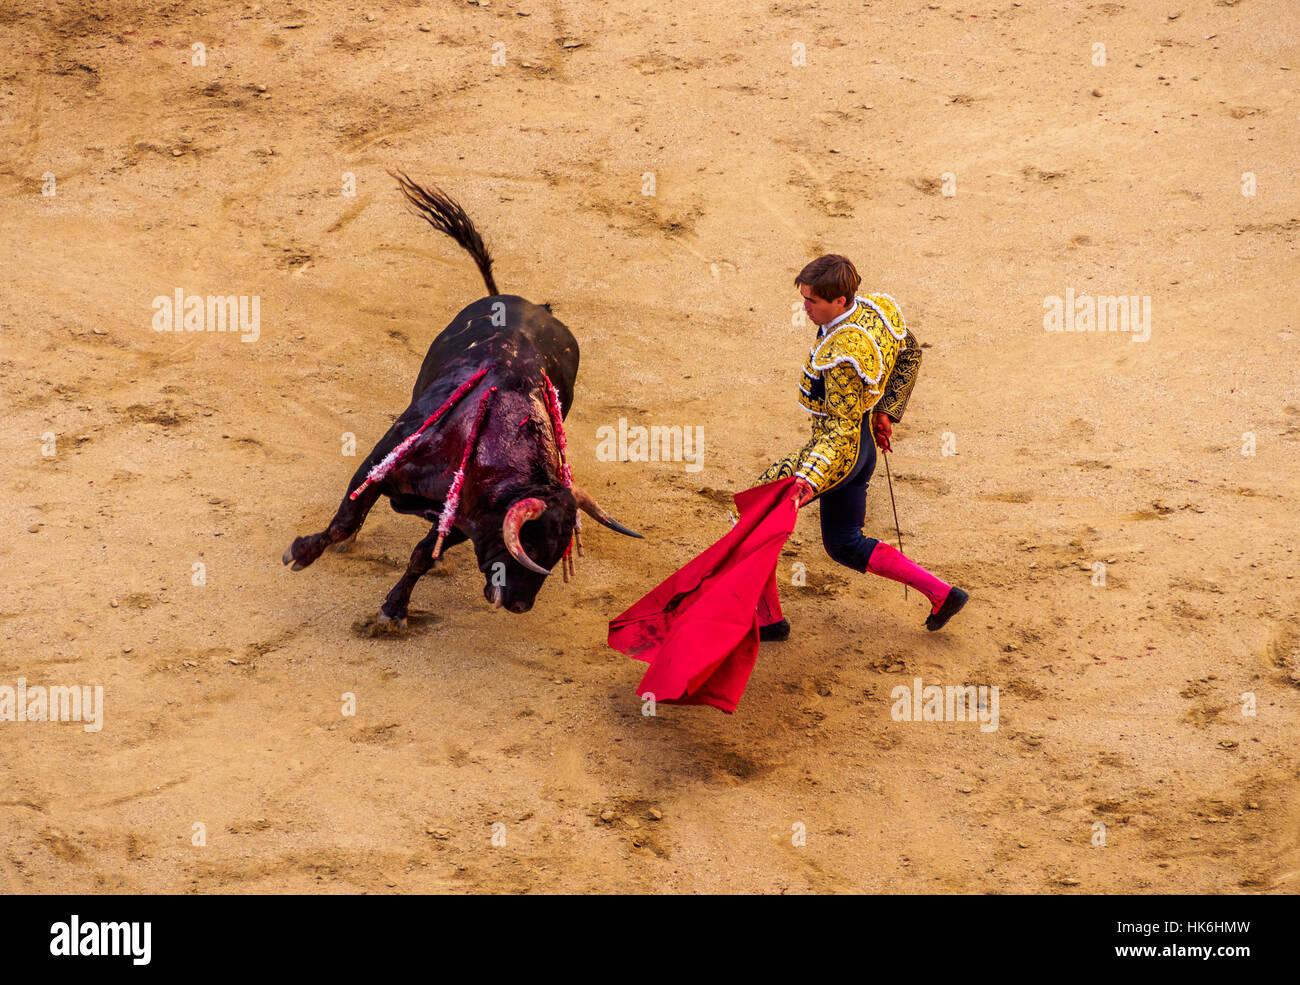 Bullfighter teases hurt bull with red cape in bullfighting arena, muleta, novice bullfight, Novillada Picada, torero, - Stock Image